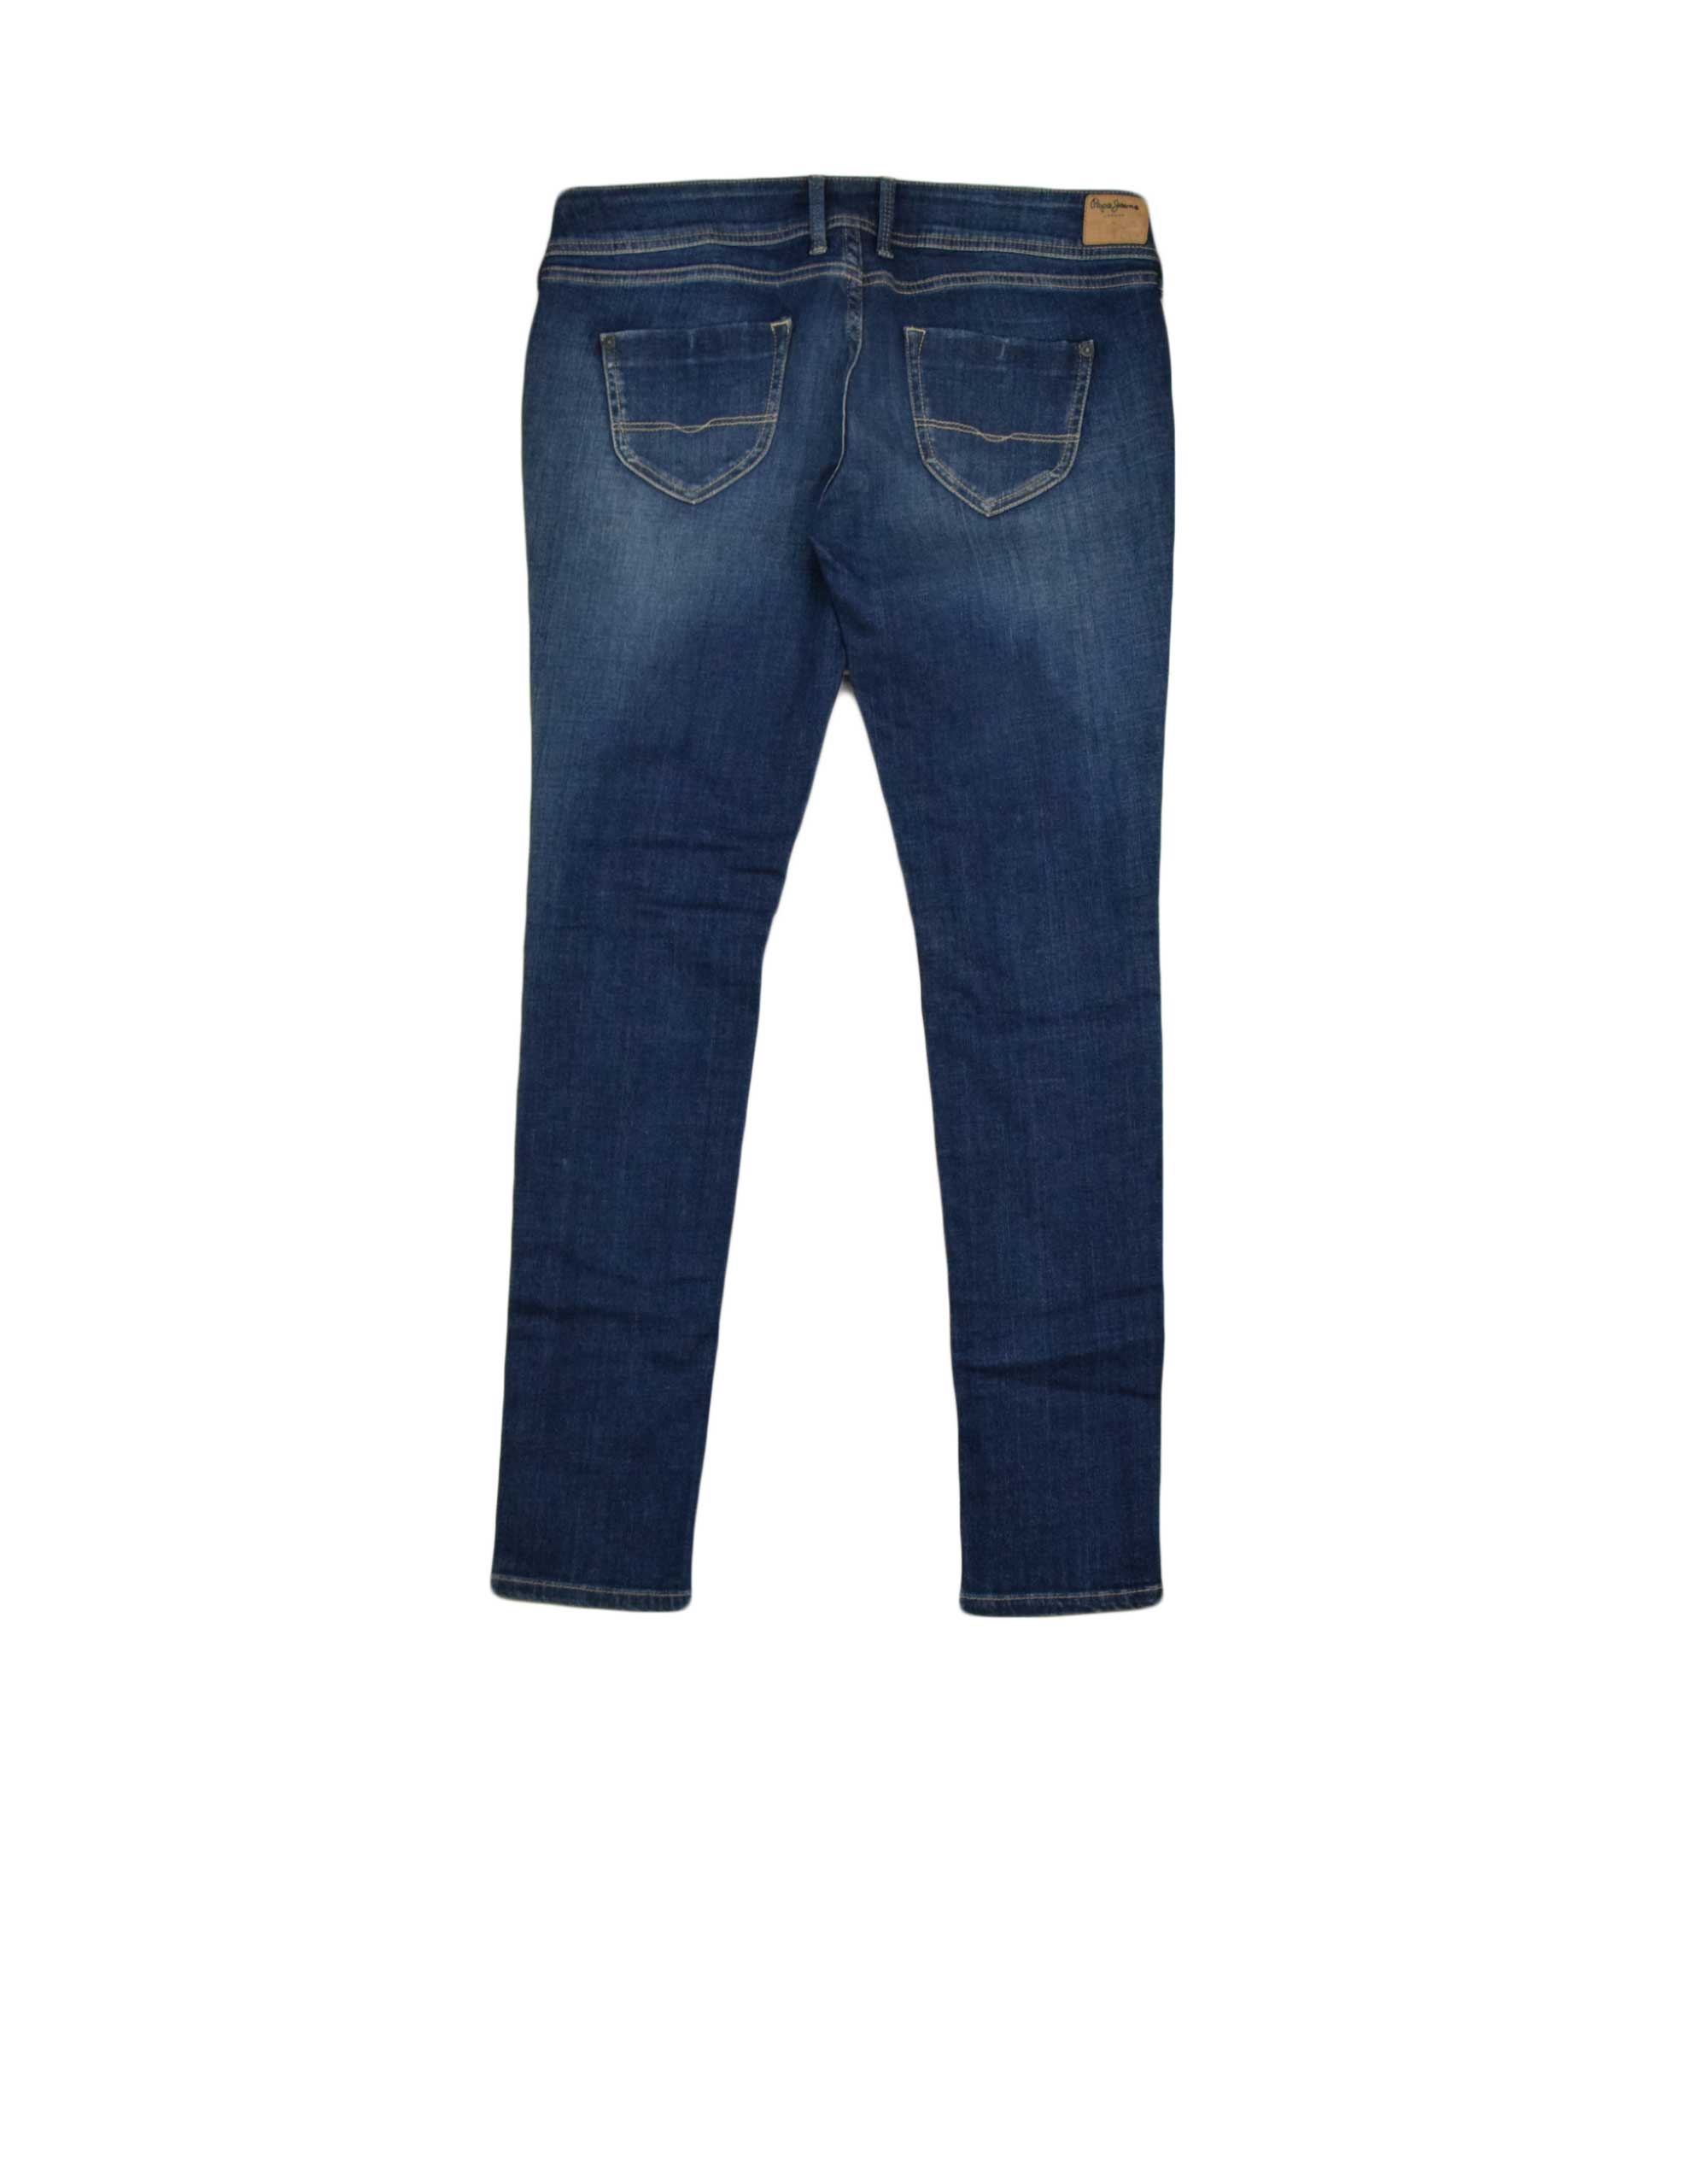 Pepe Jeans Ehren Skinny (PL201055Q232) Blue Denim